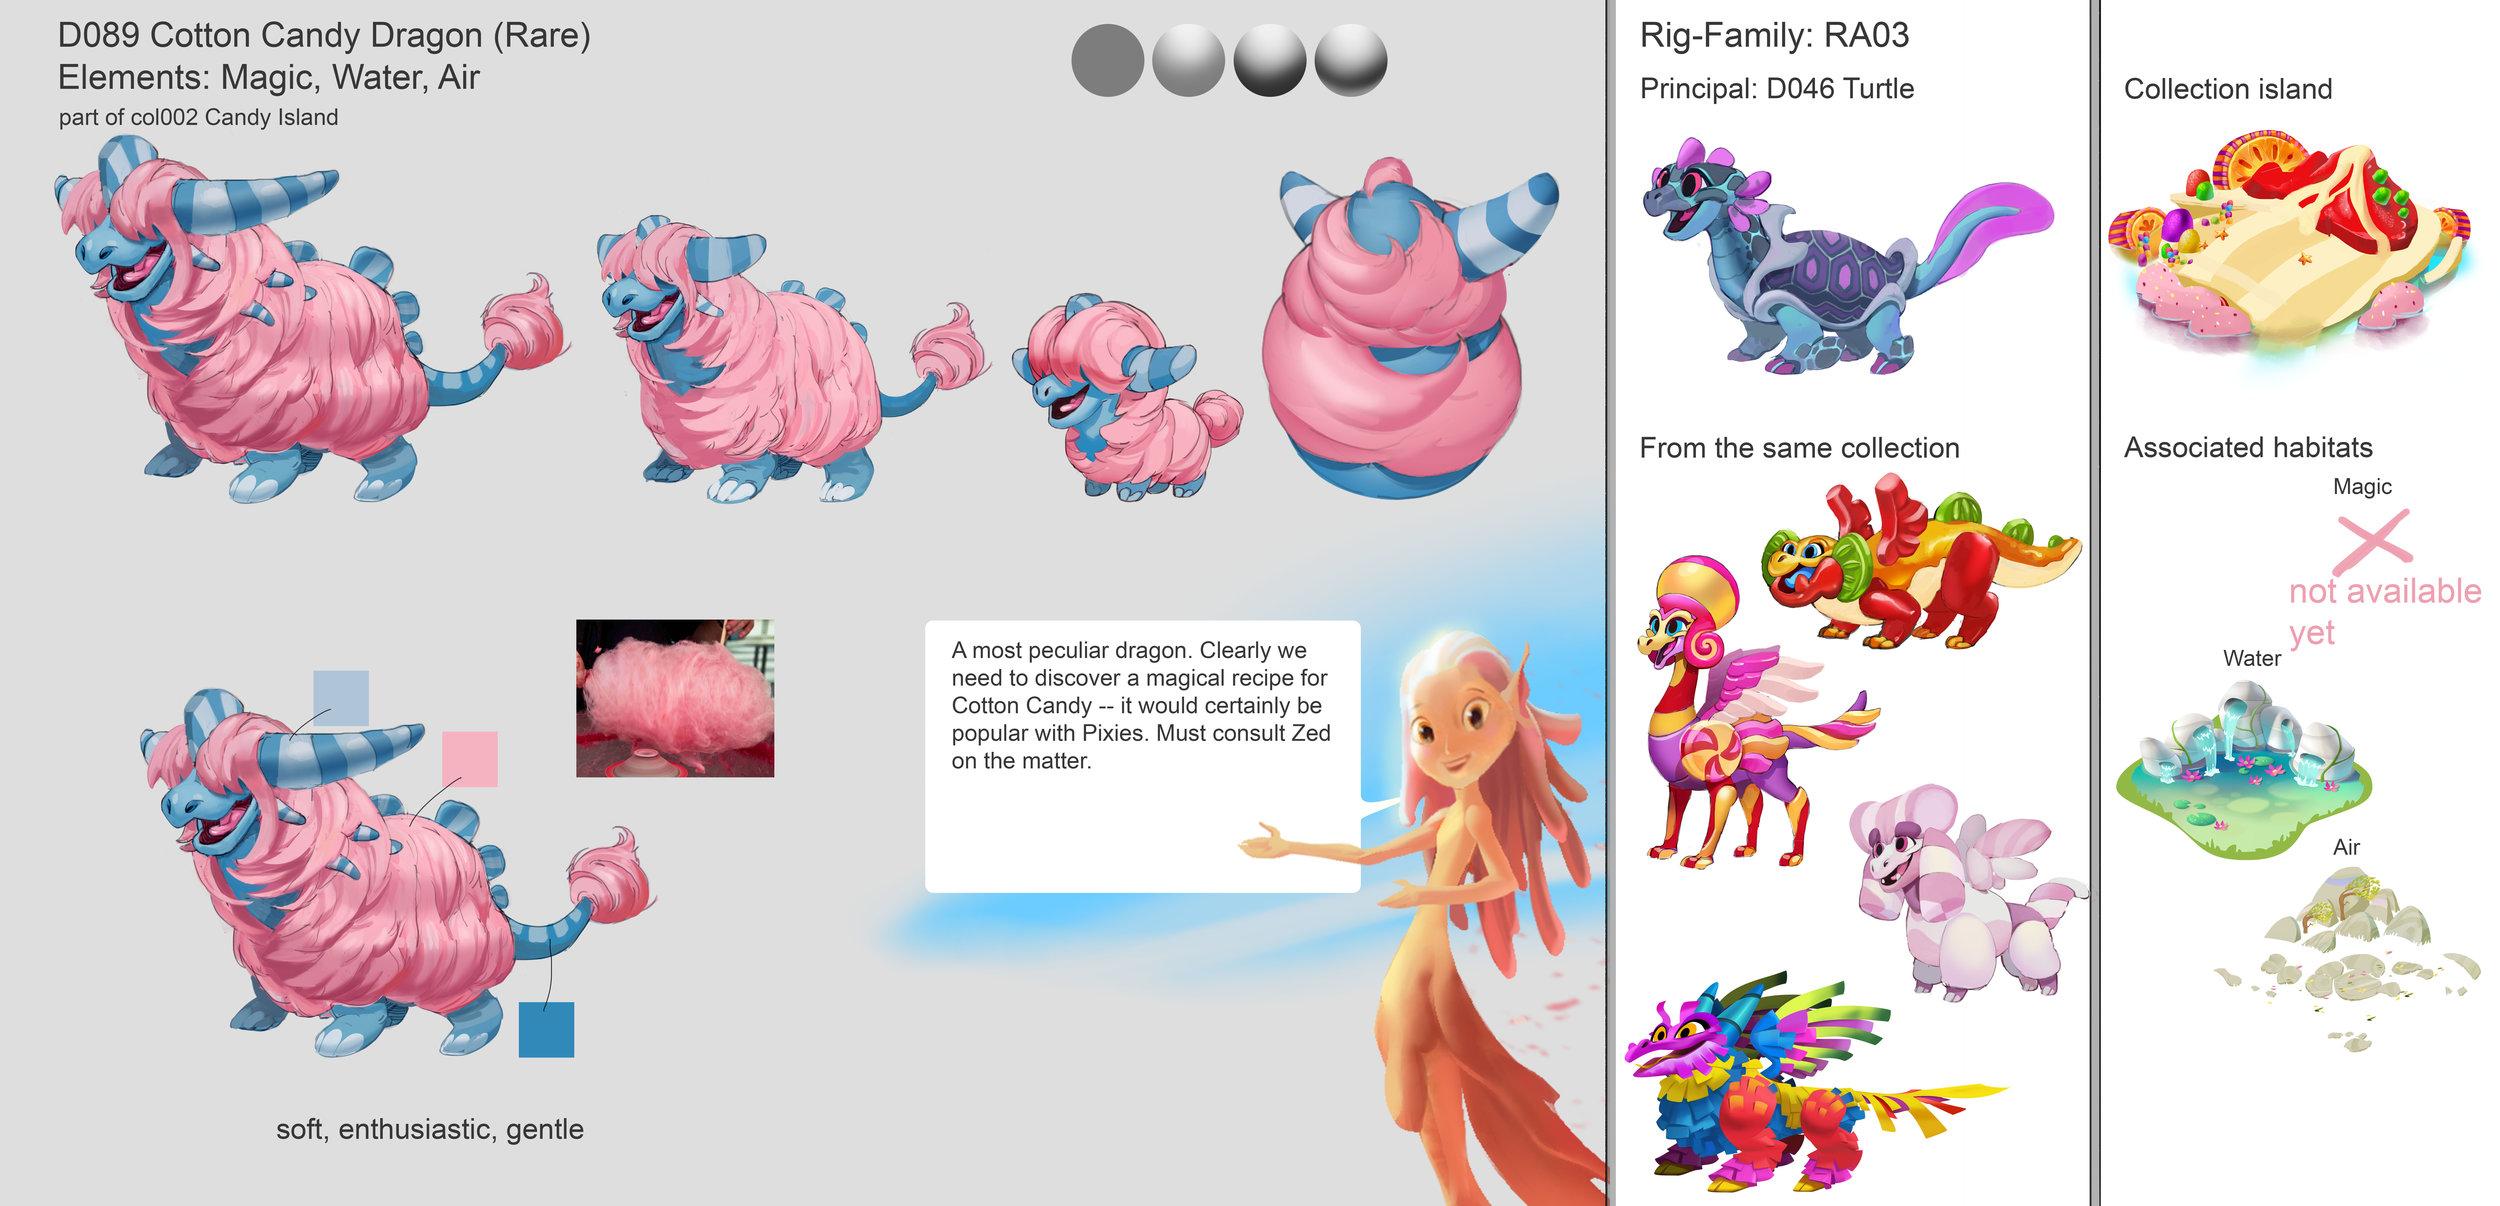 D089_gameart_information.jpg